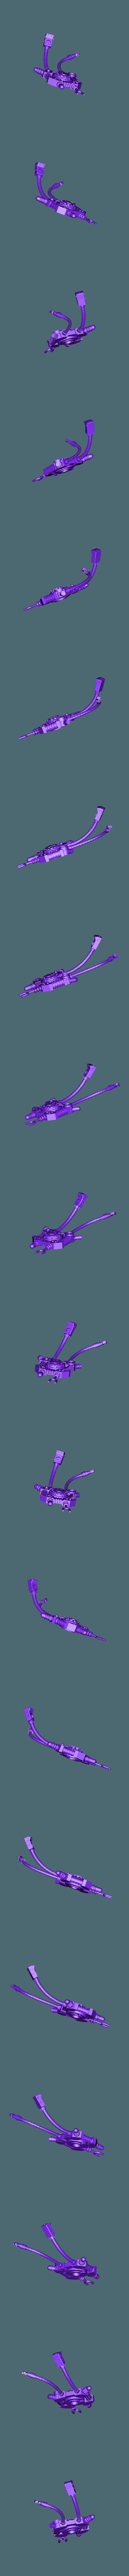 Reposed_Ranger_5.1_-_Backpack.stl Download free STL file Martian Mechanized Rangers • 3D printable object, ErikTheHeretek